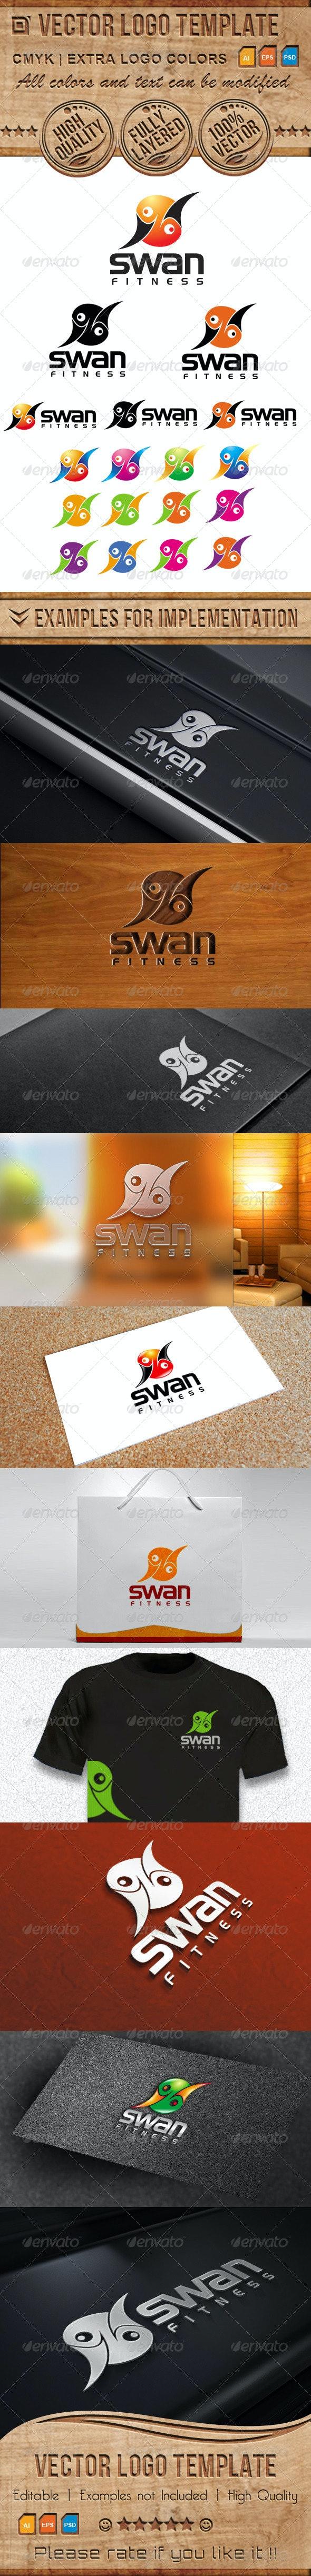 Fitness, Swan Vector Logo Template - Animals Logo Templates